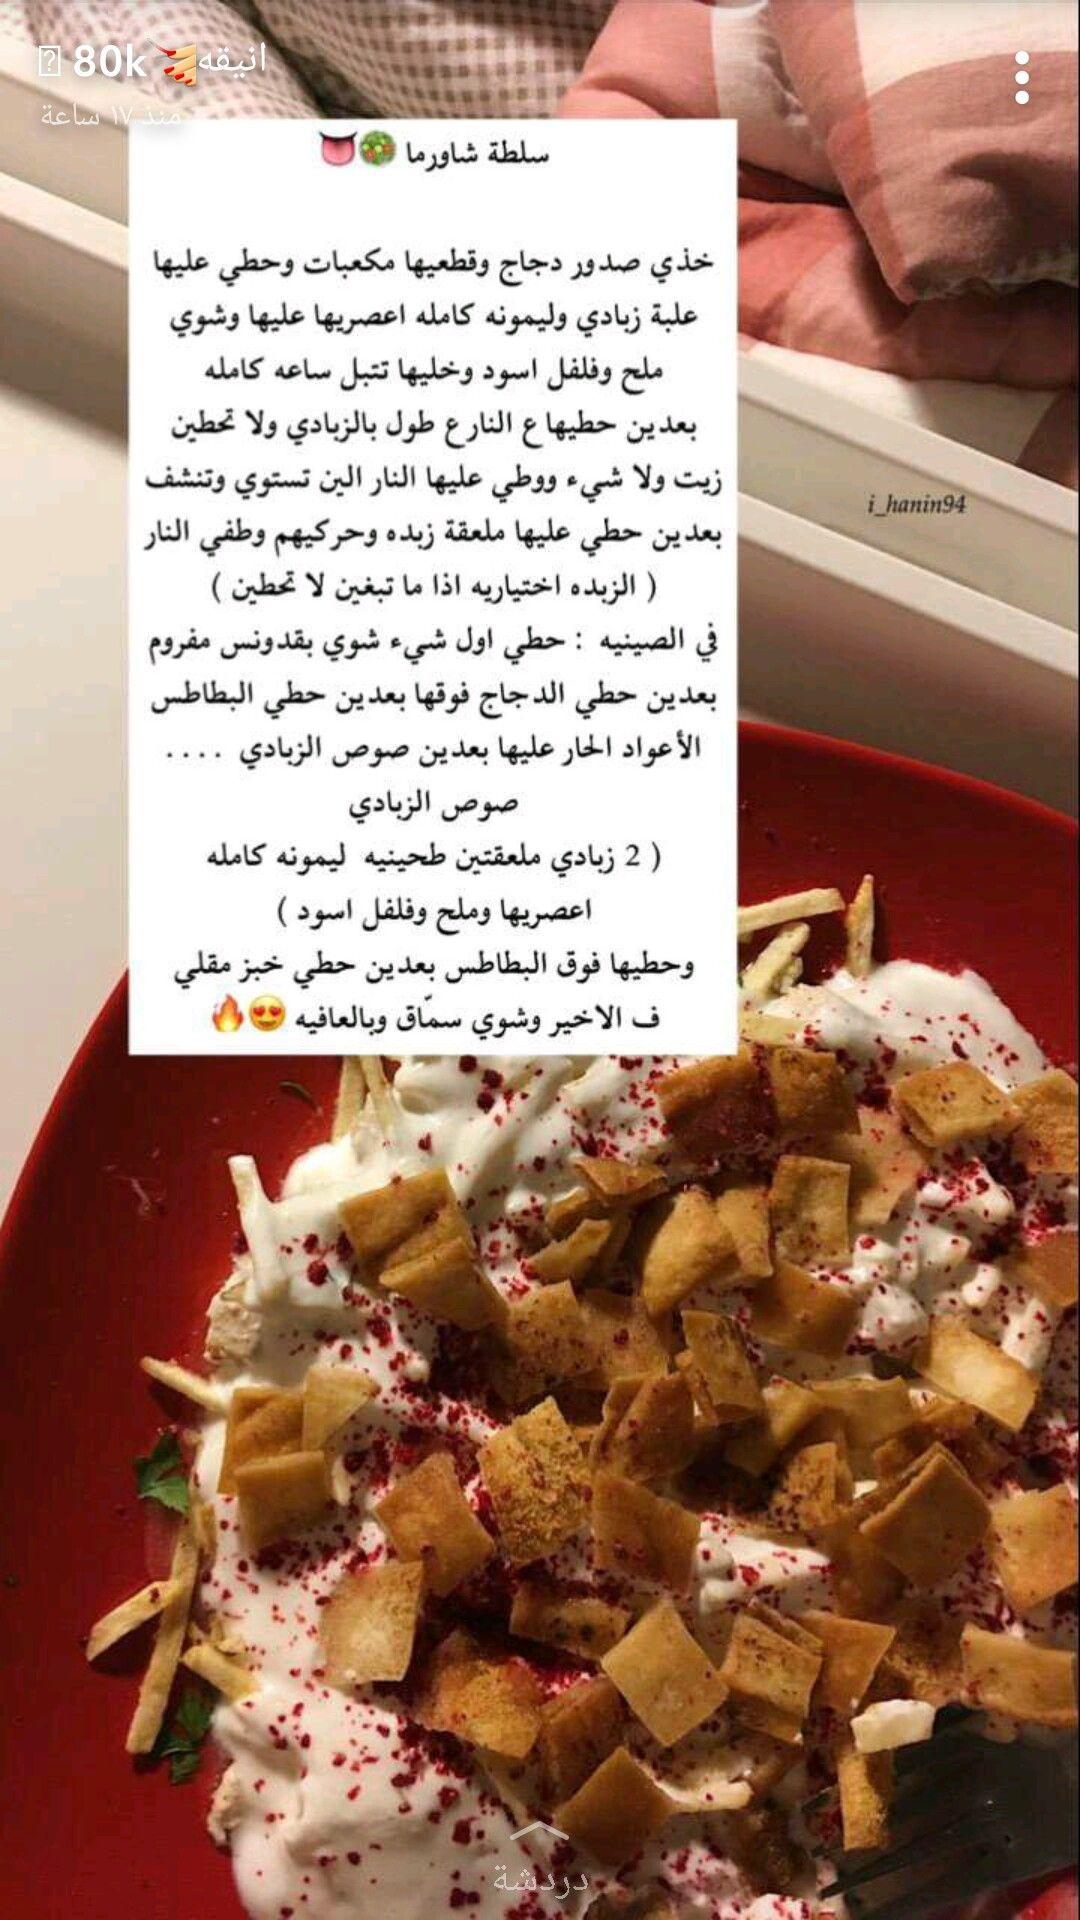 طبخ رمضان Cookout Food Food Receipes Arabic Food